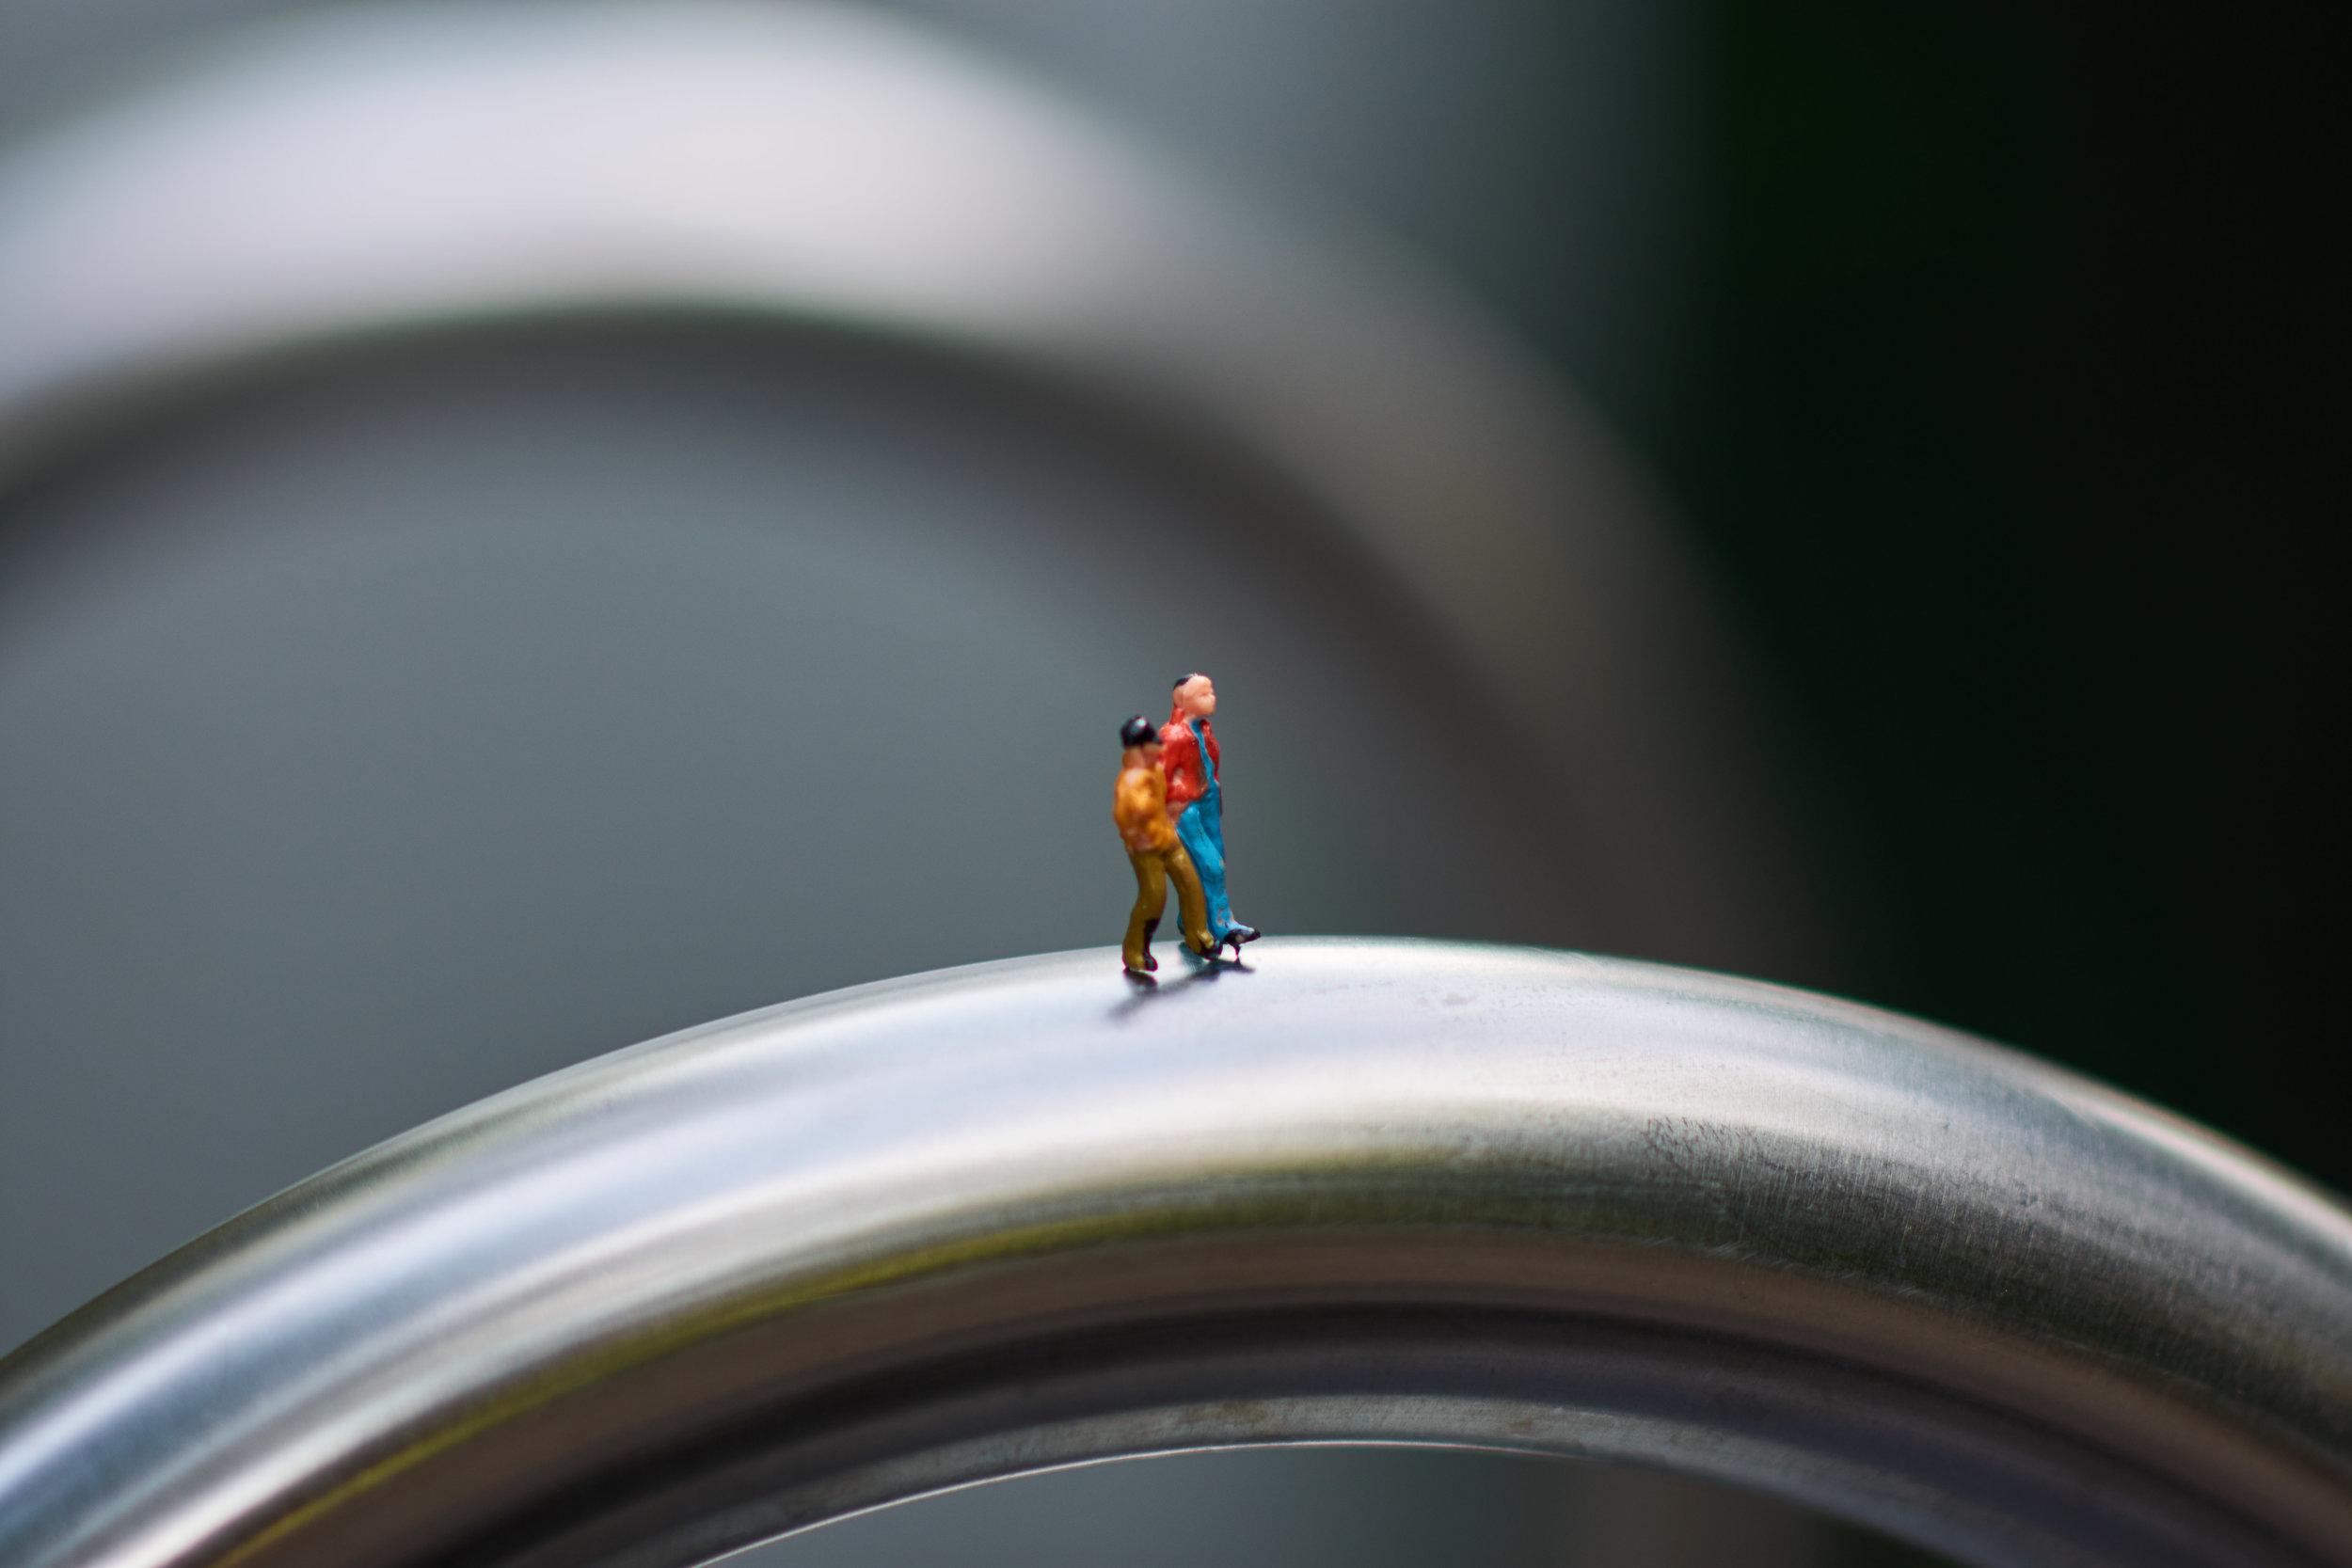 MiniatureDSC_0717.jpg